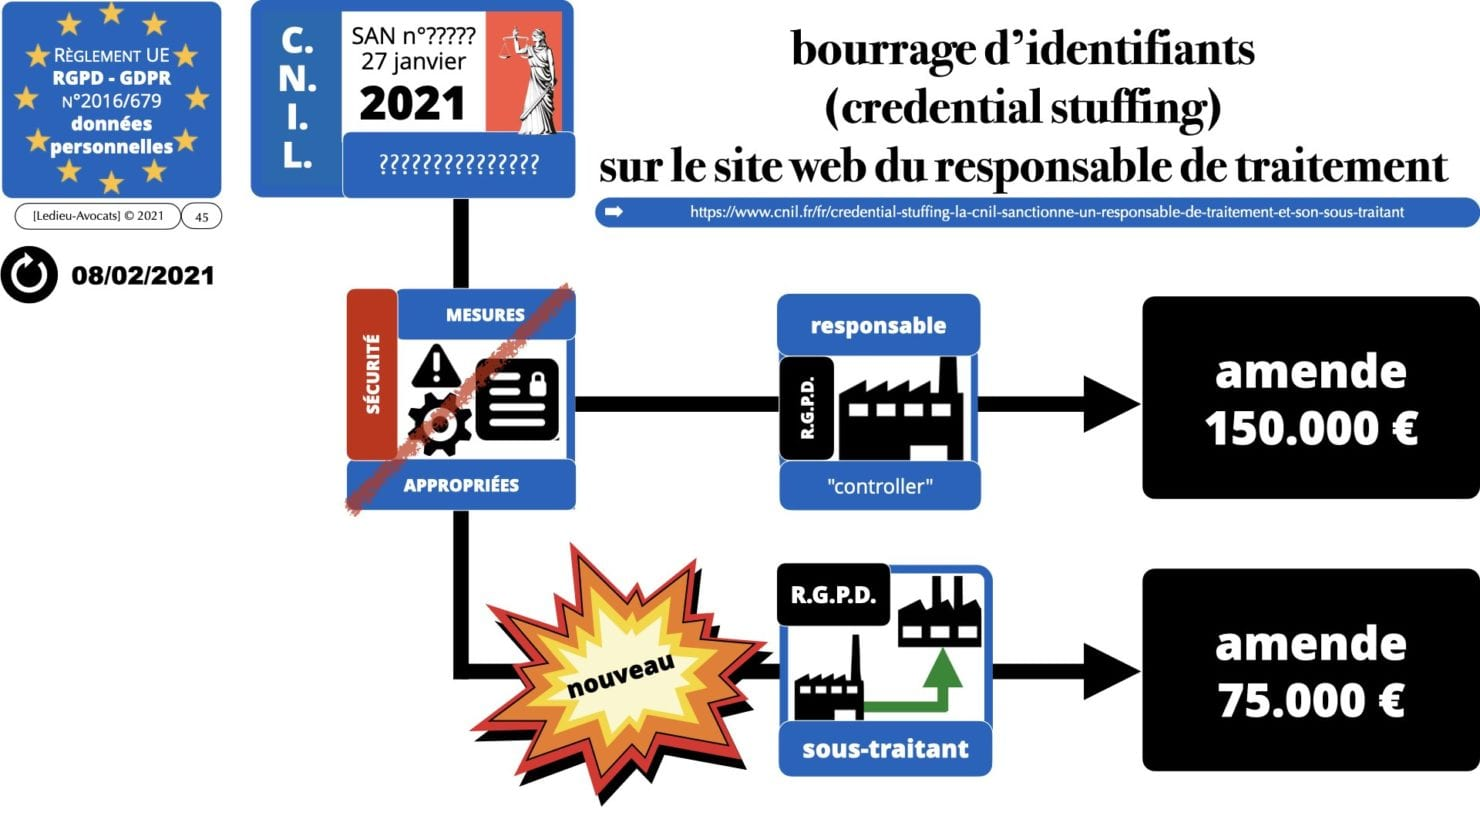 RGPD e-Privacy principes actualité jurisprudence ©Ledieu-Avocats 25-06-2021.045